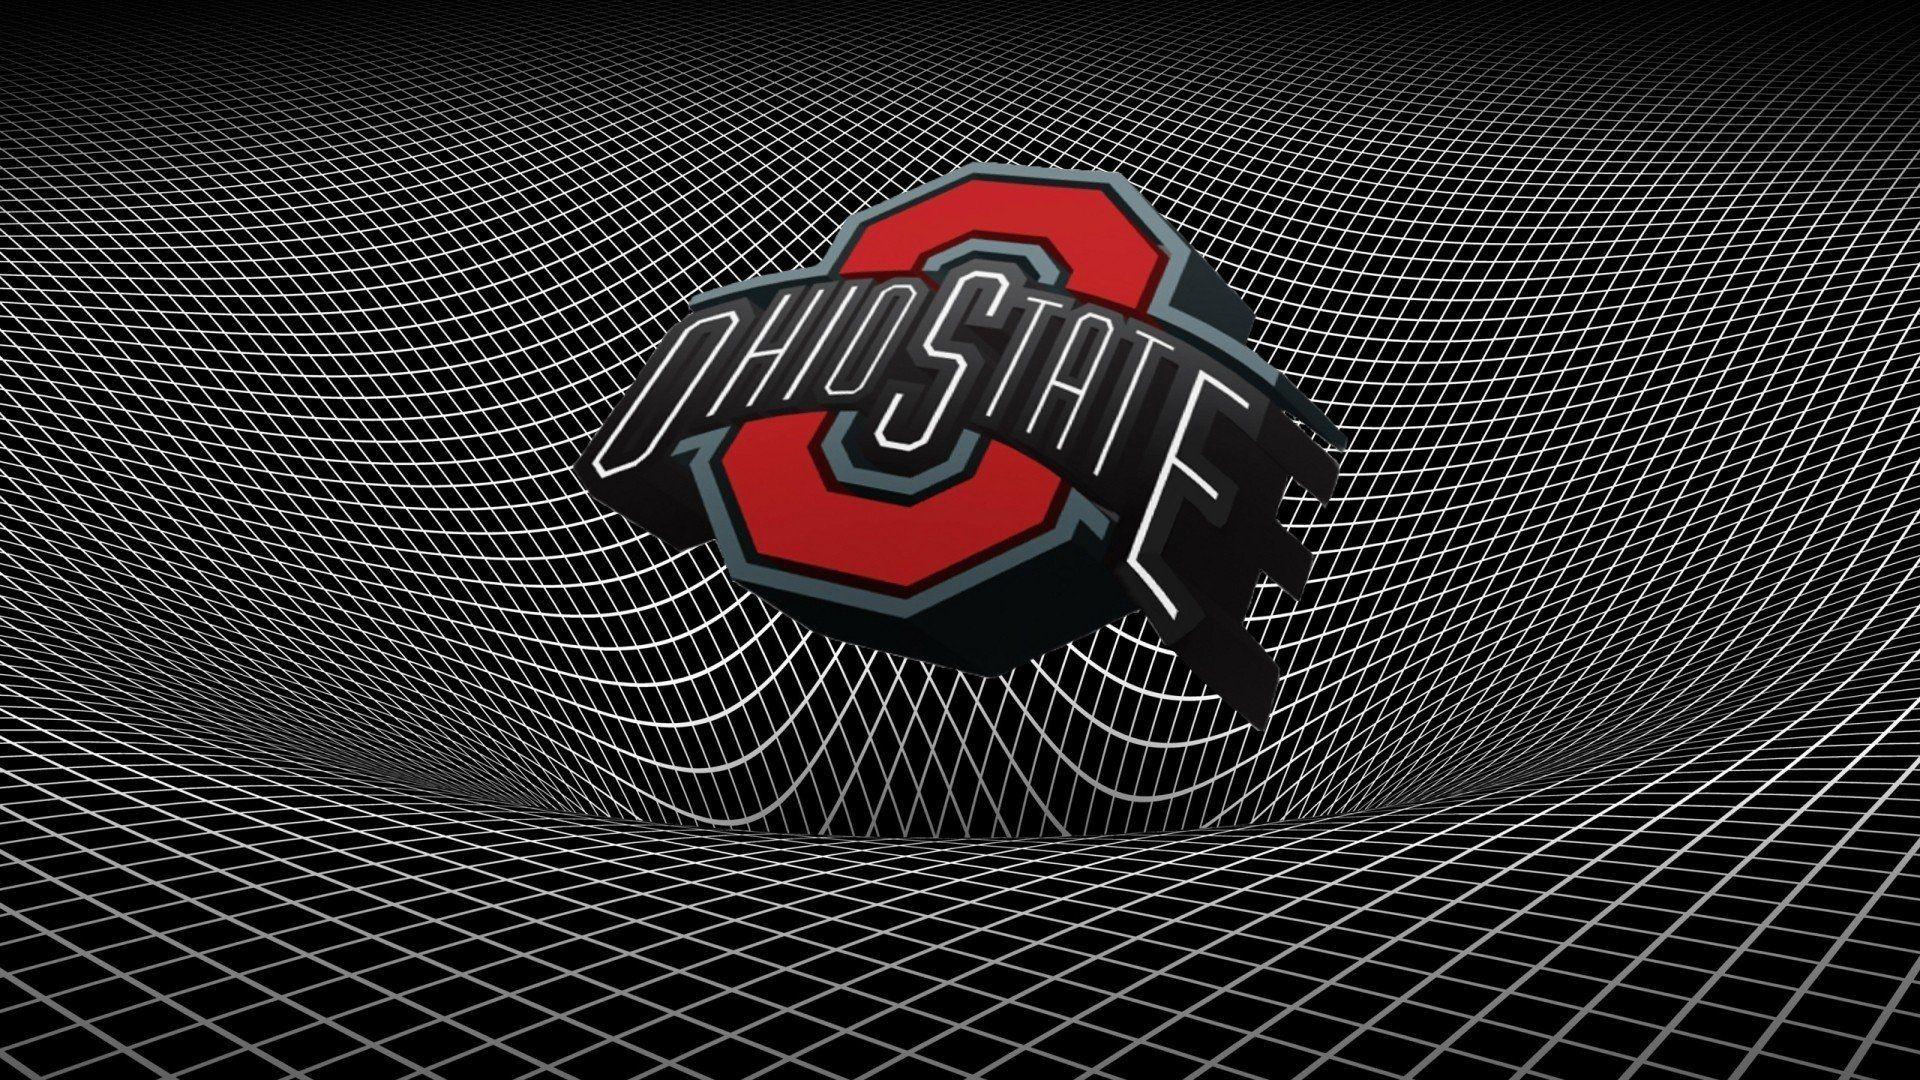 Sports American Football NFL logos Ohio State football teams .